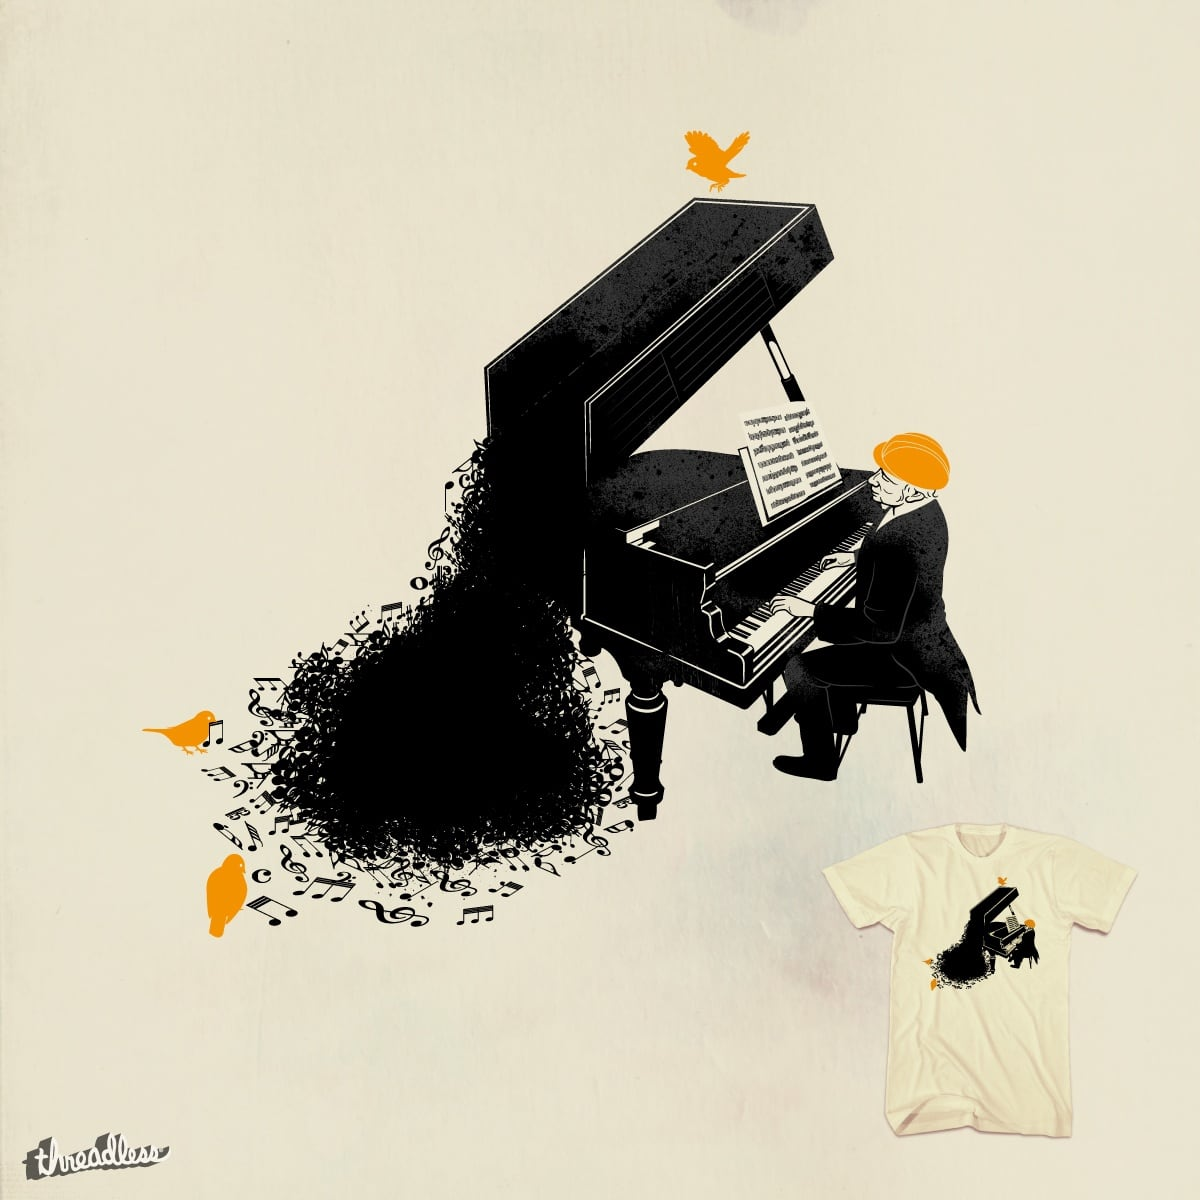 piano operator by anivini on Threadless